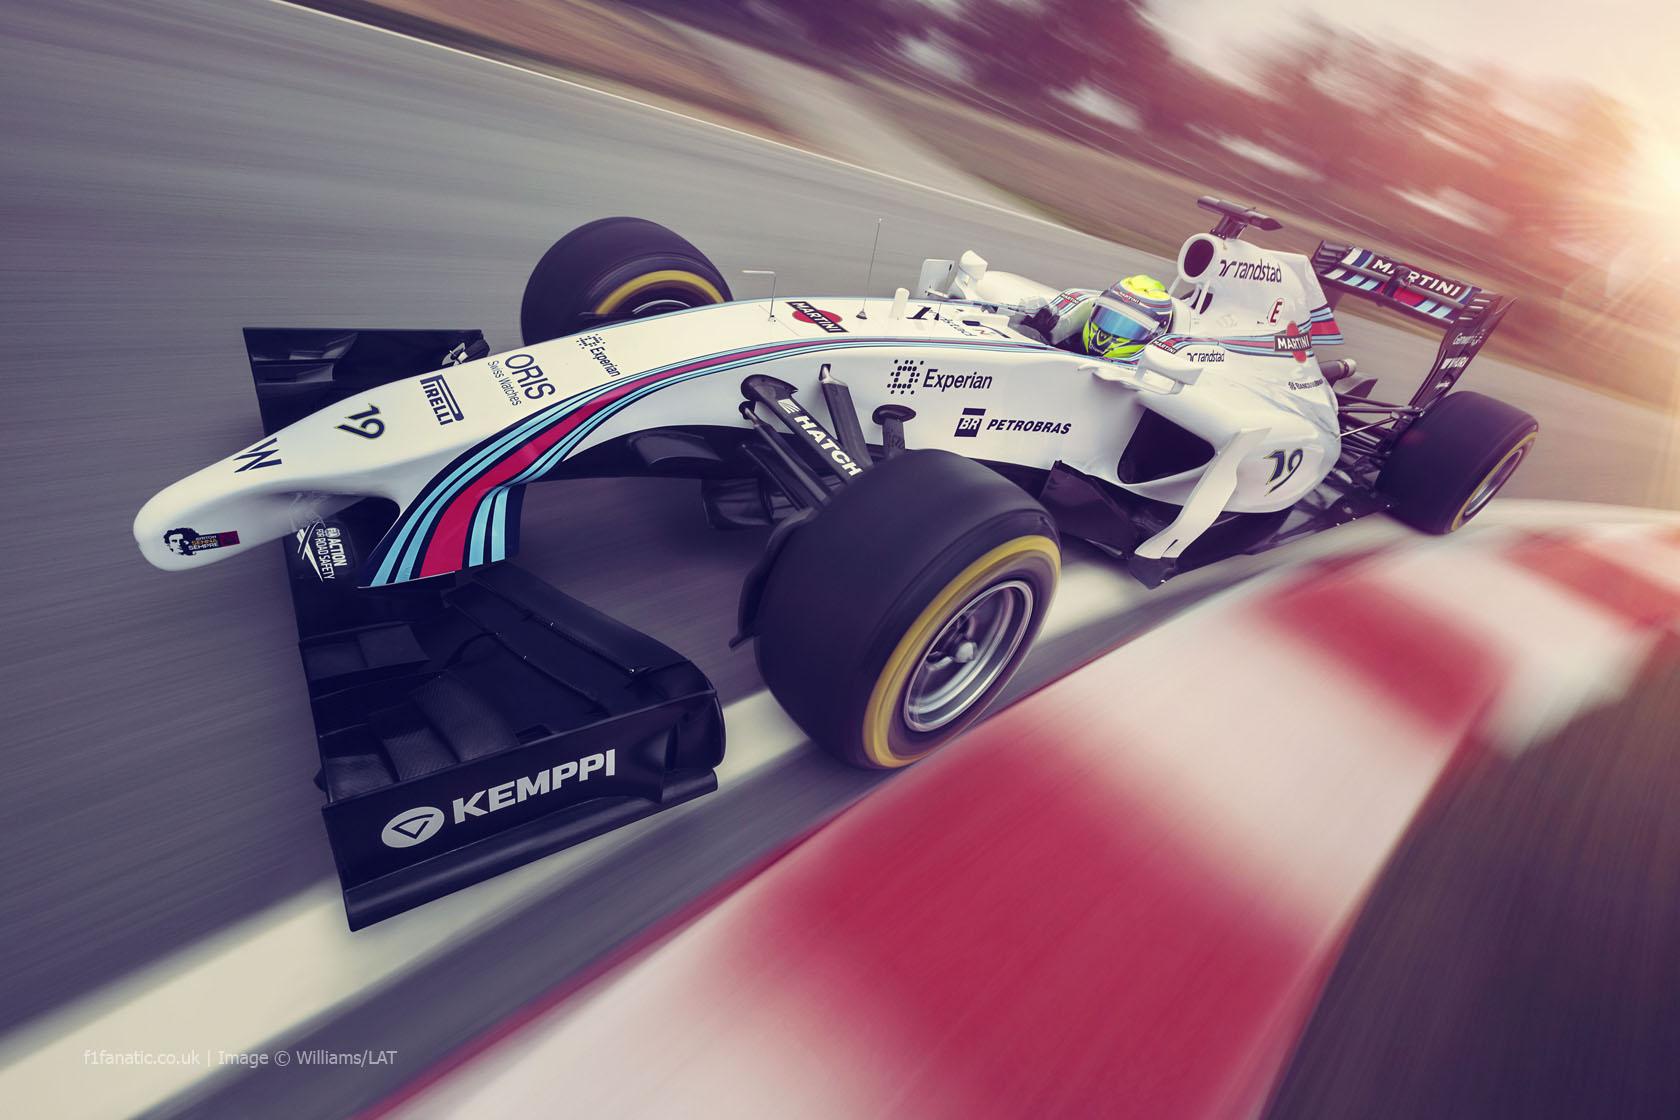 Williams FW36 - Martini livery reveal, 2014